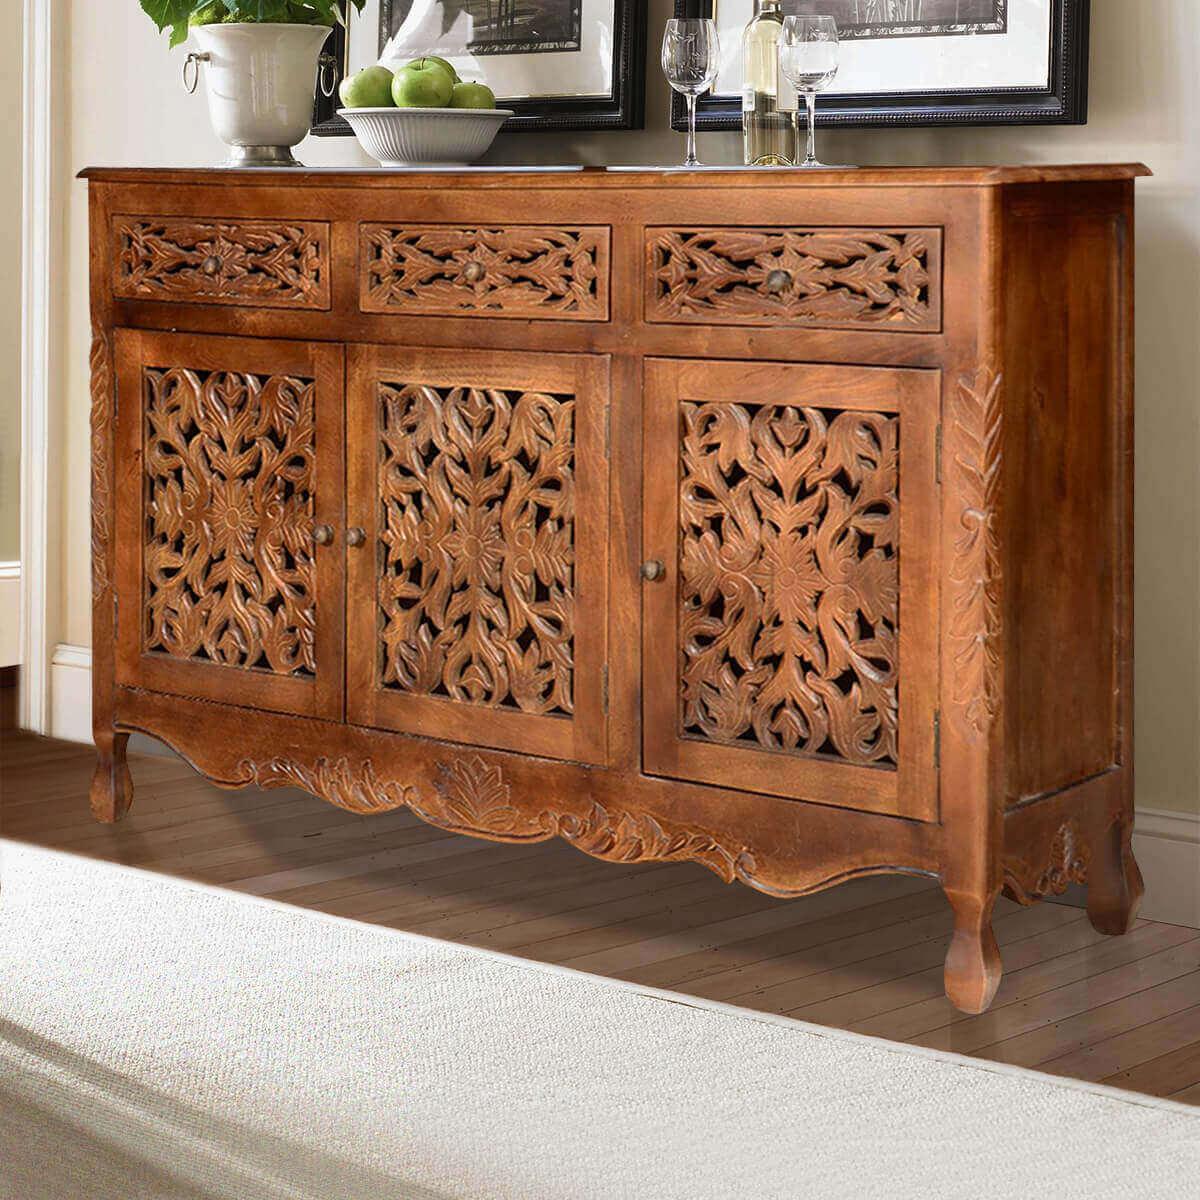 Pennsylvania Mango Wood Hand Carved Rustic Buffet Cabinet